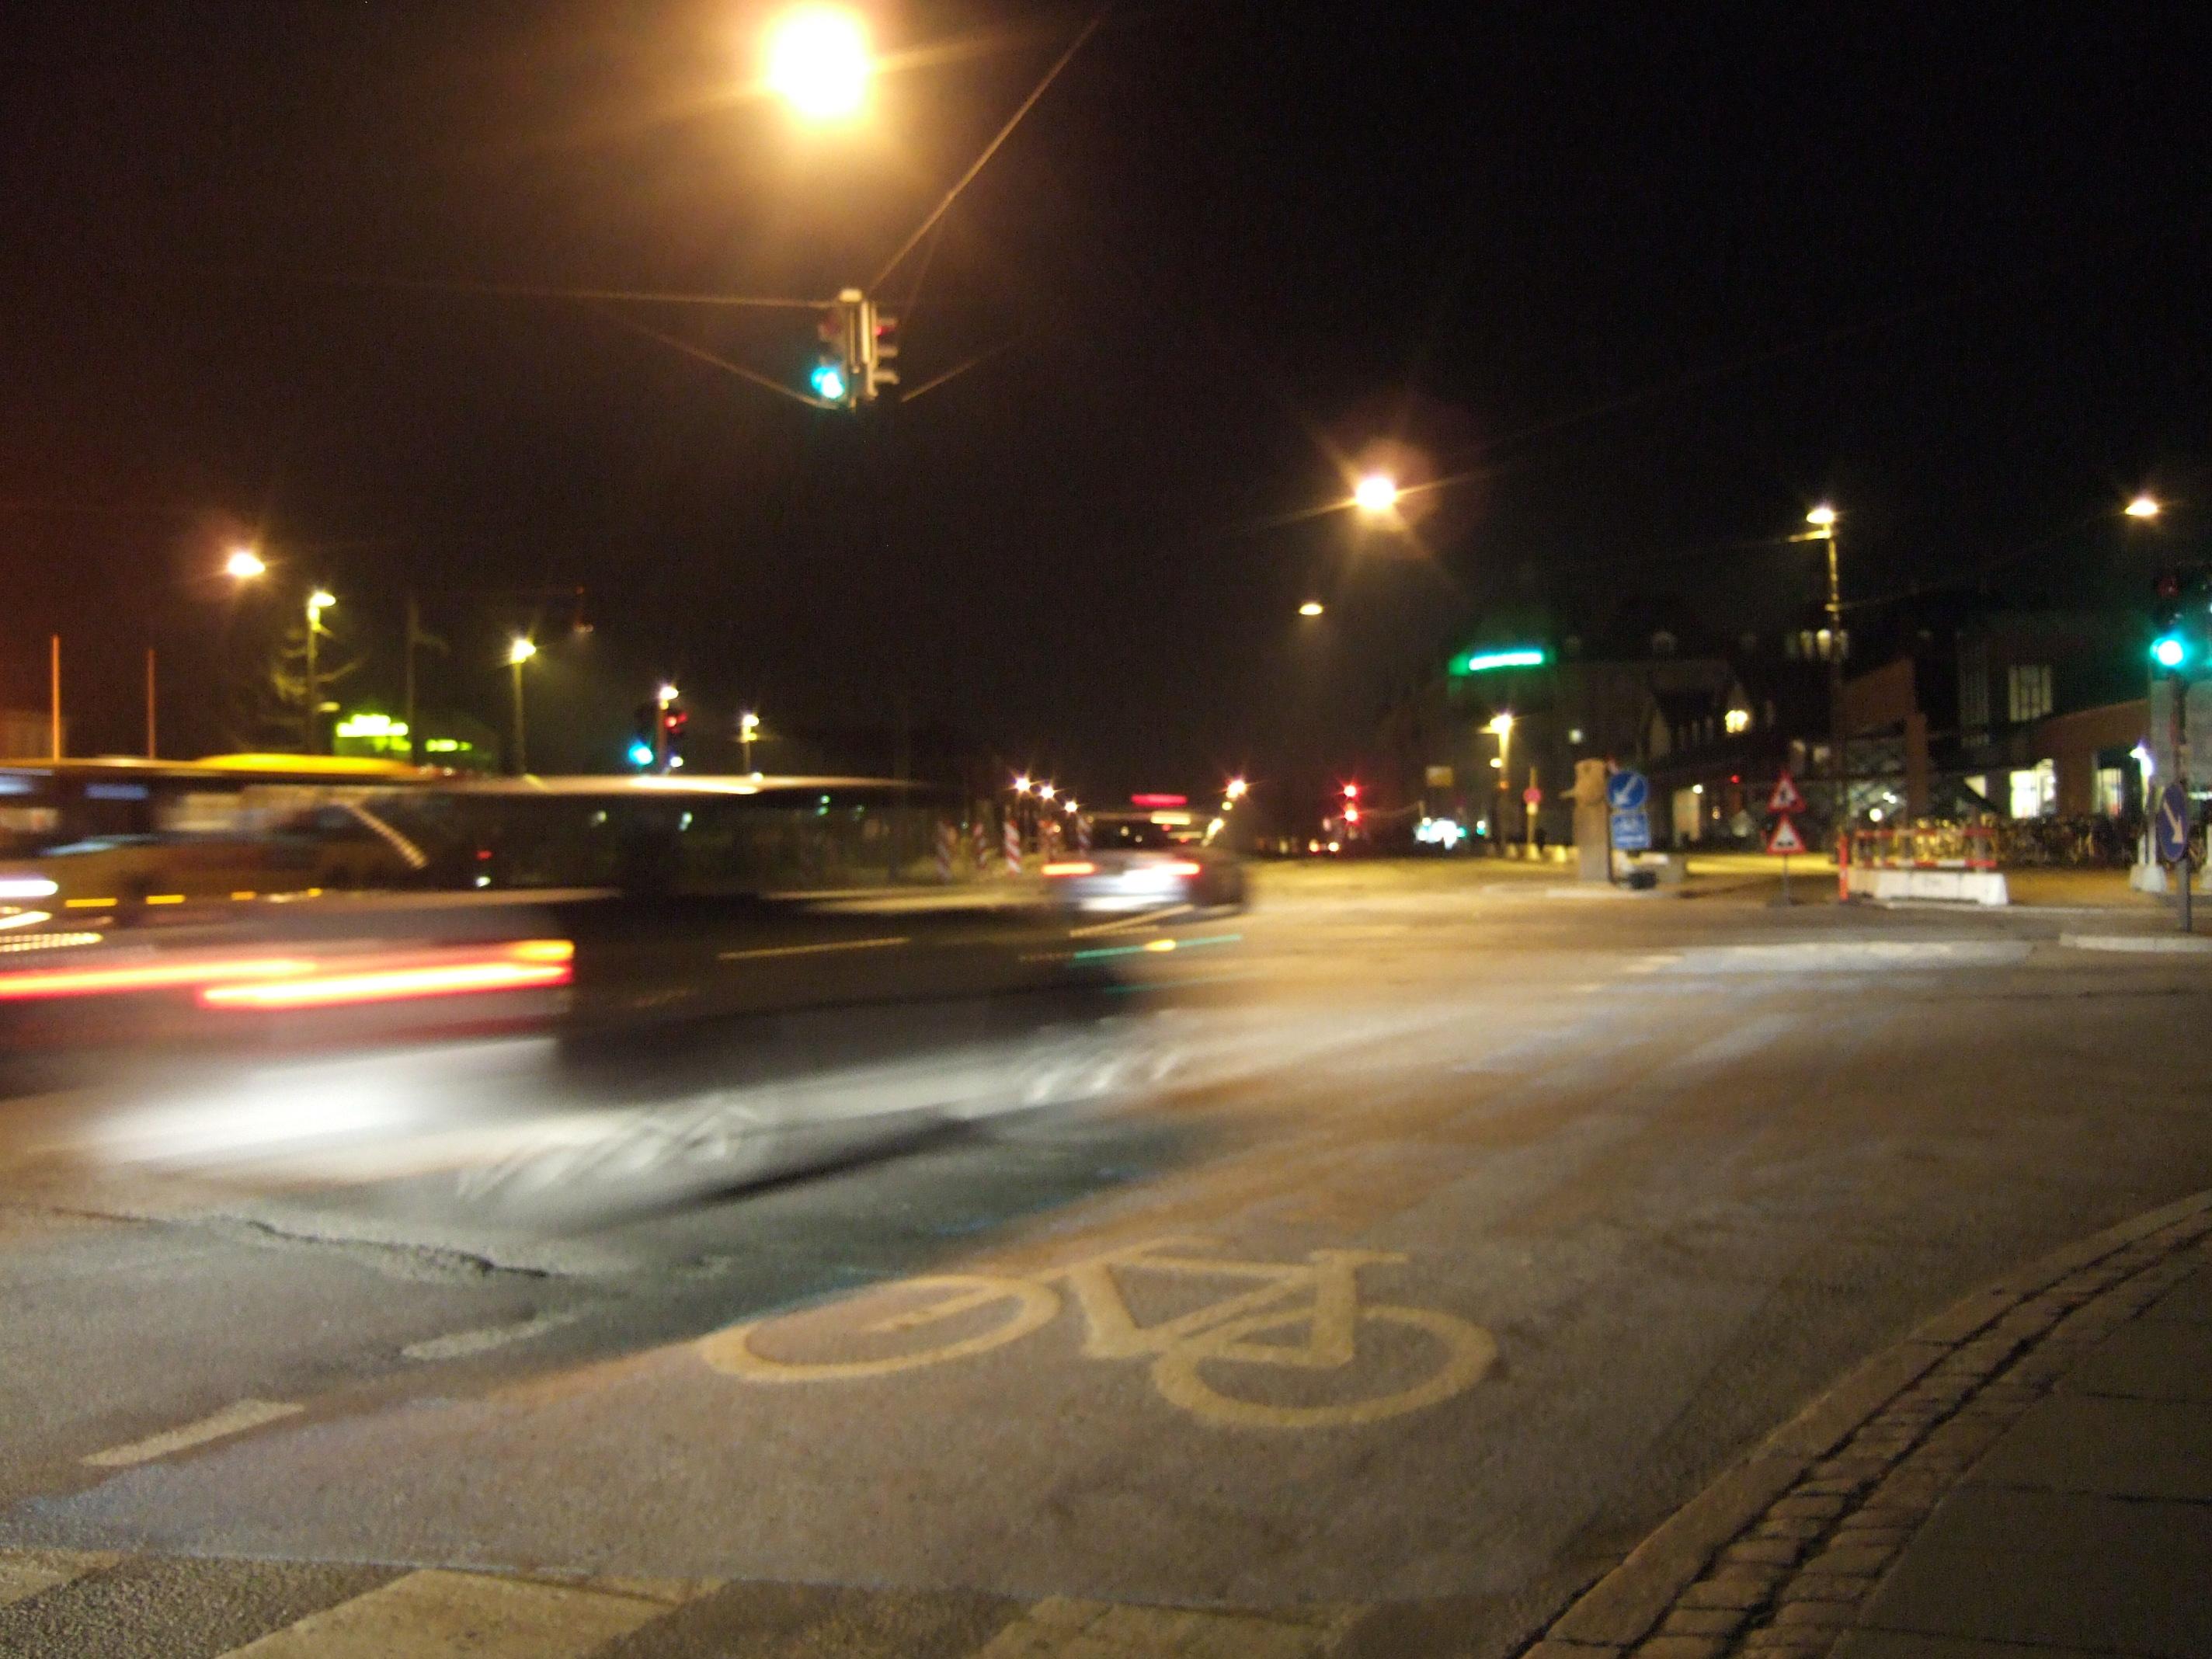 tabus city night bike road blurred